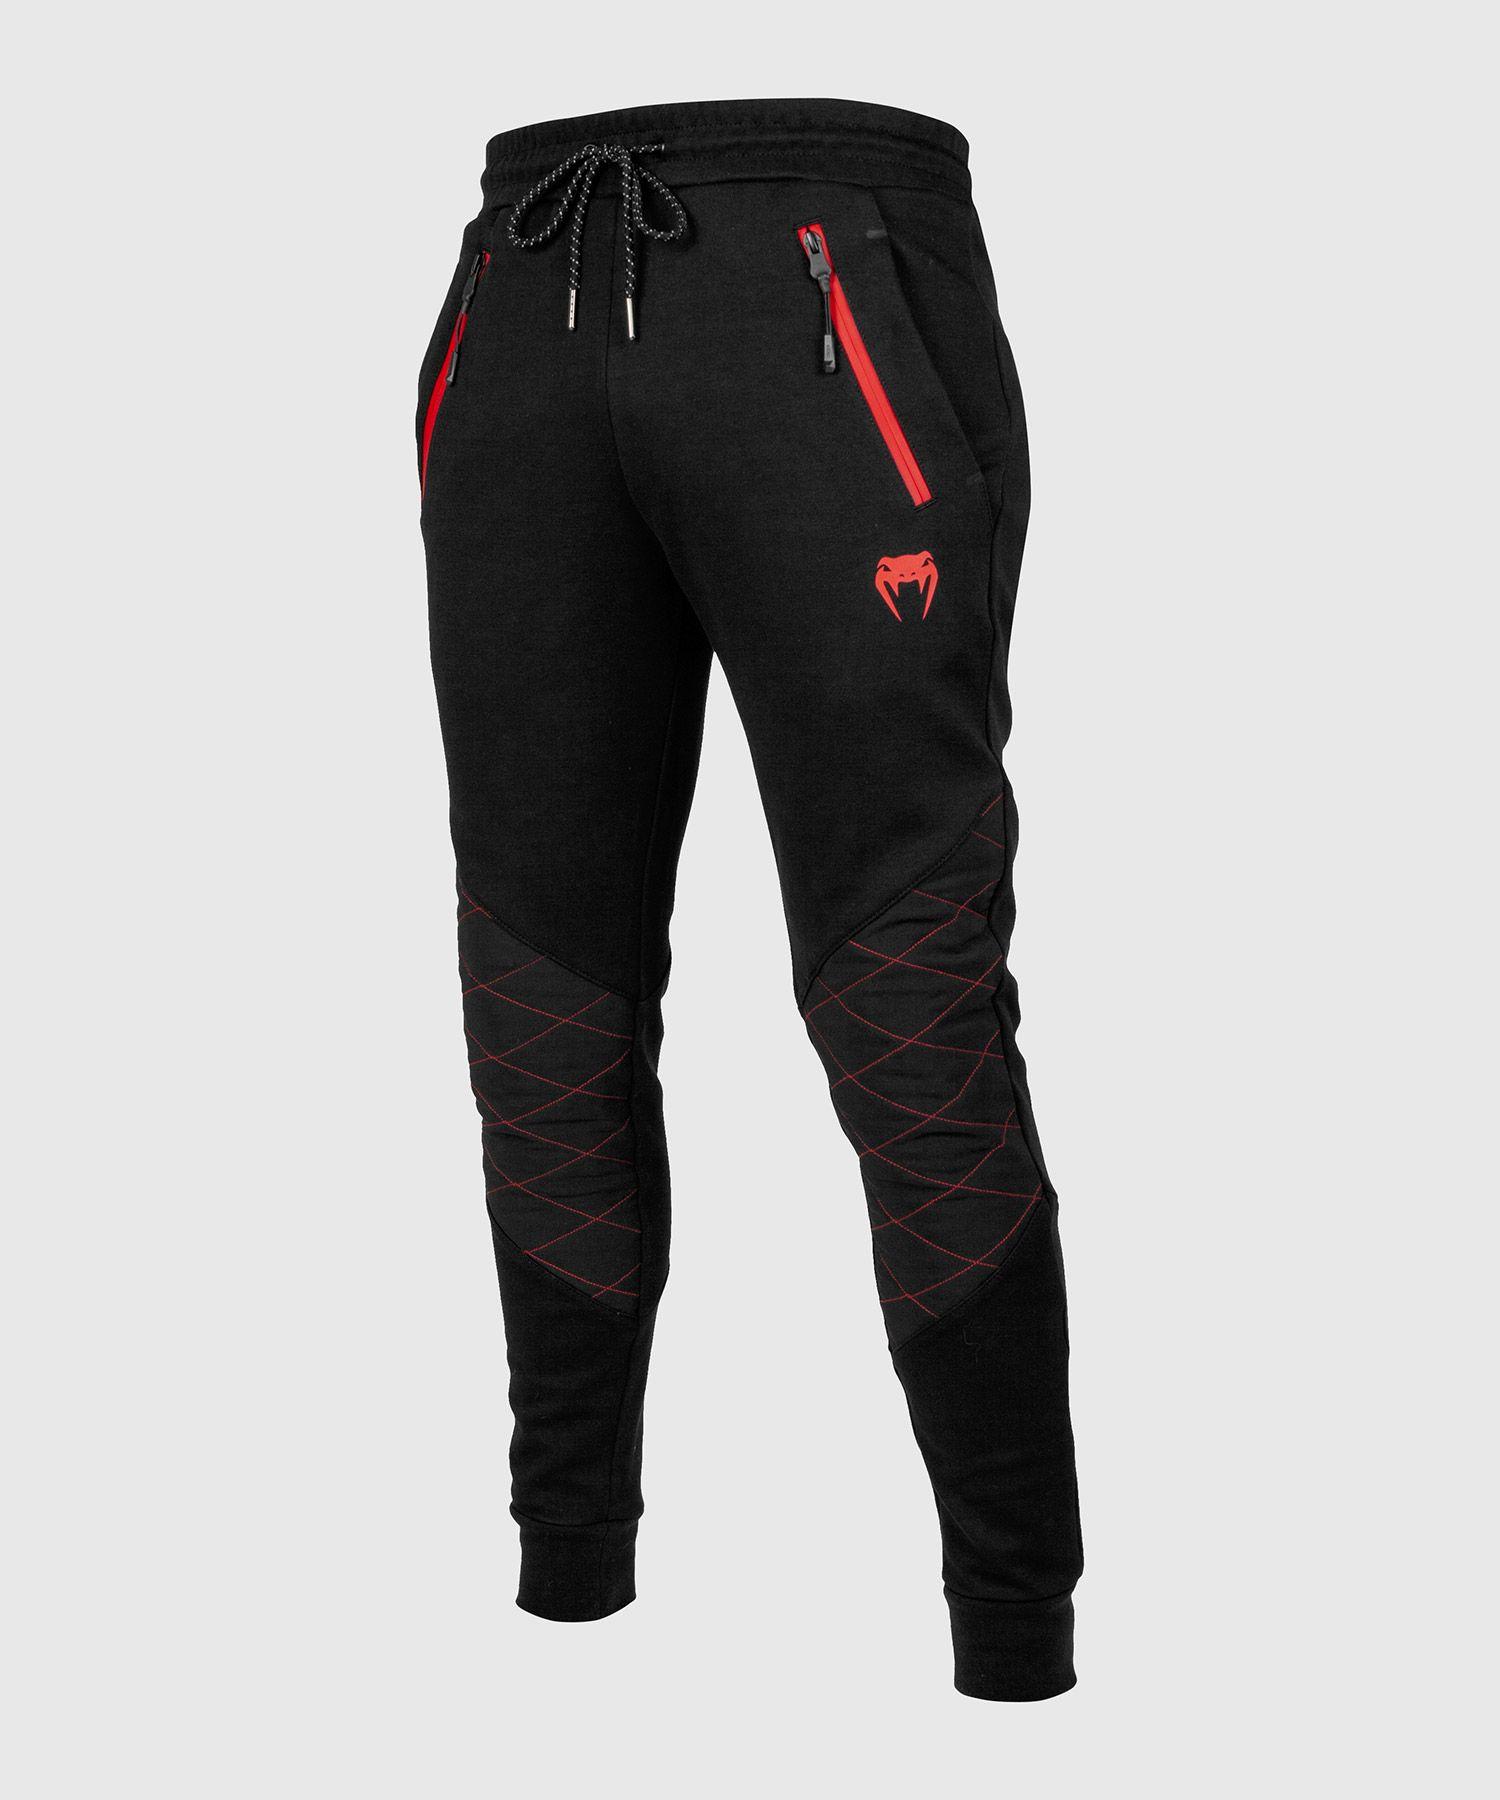 Pantaloni tuta Venum Laser 2.0  - Nero/Rosso